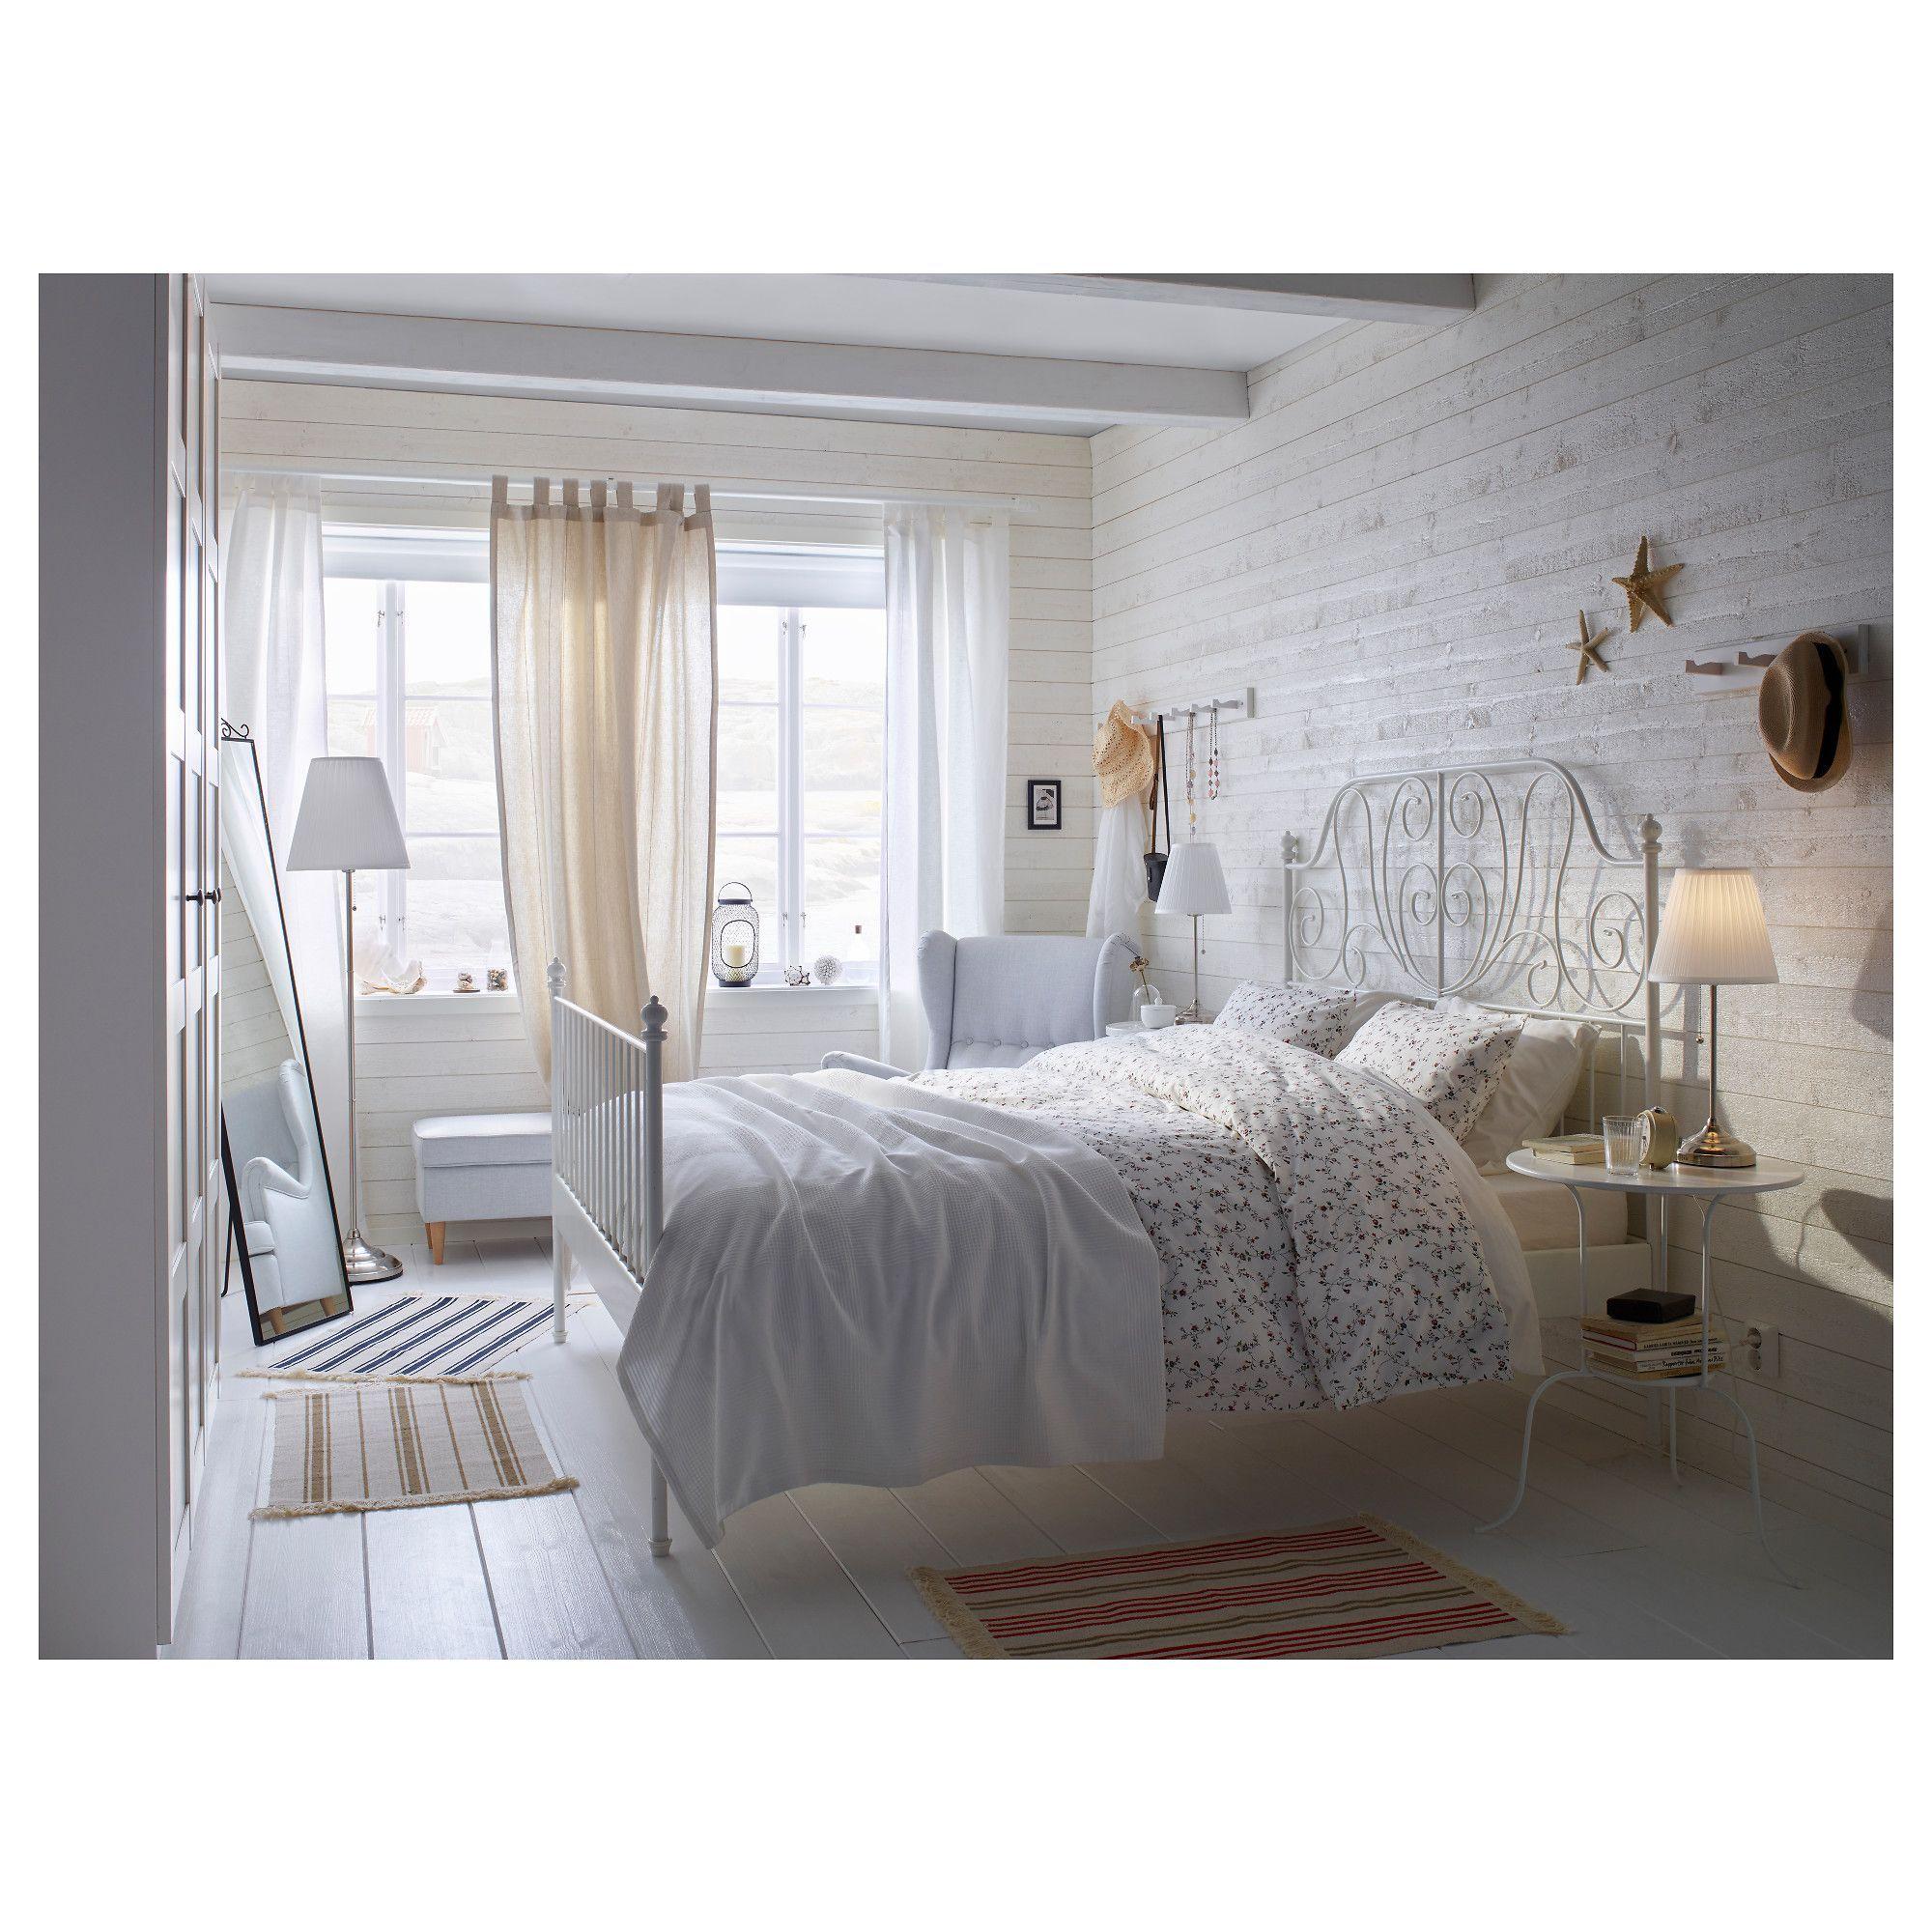 IKEA LEIRVIK Bed frame white, Espevär Bedroom project